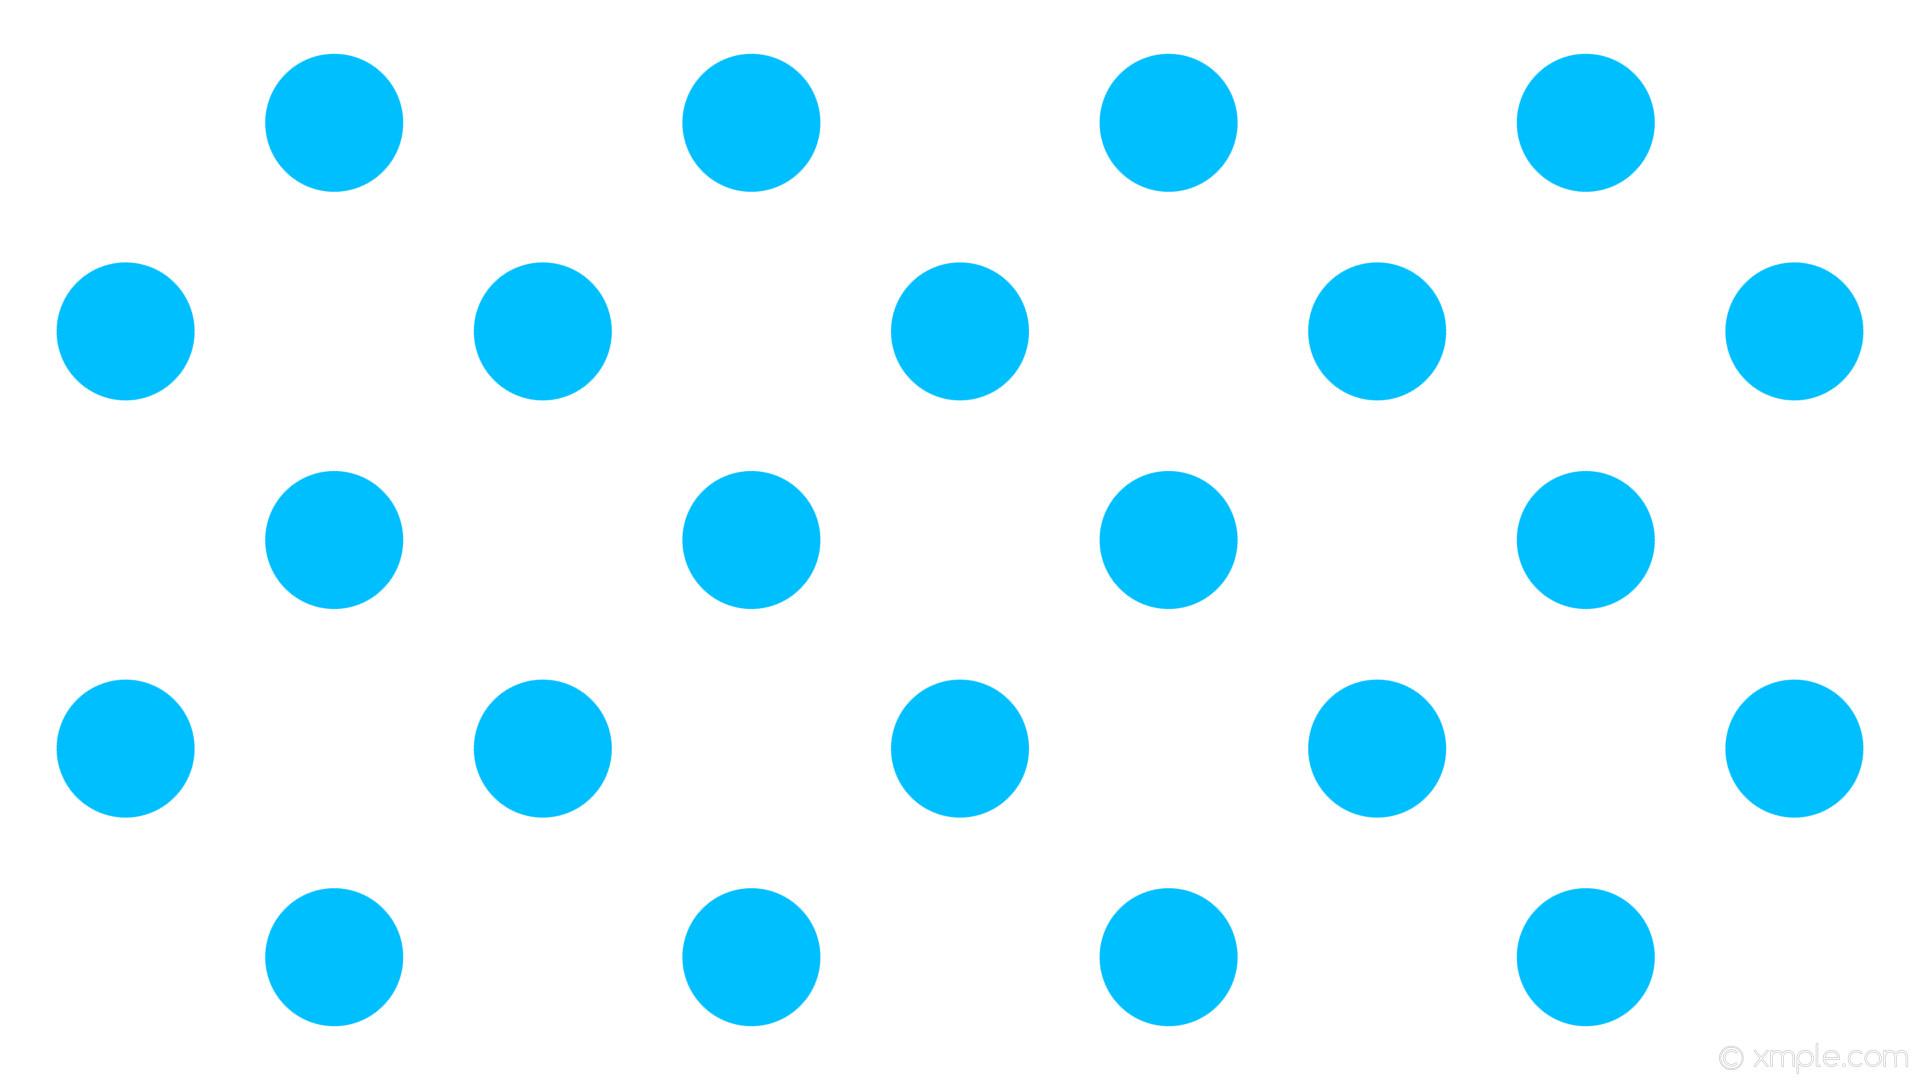 wallpaper white polka dots spots blue deep sky blue #ffffff #00bfff 225°  138px